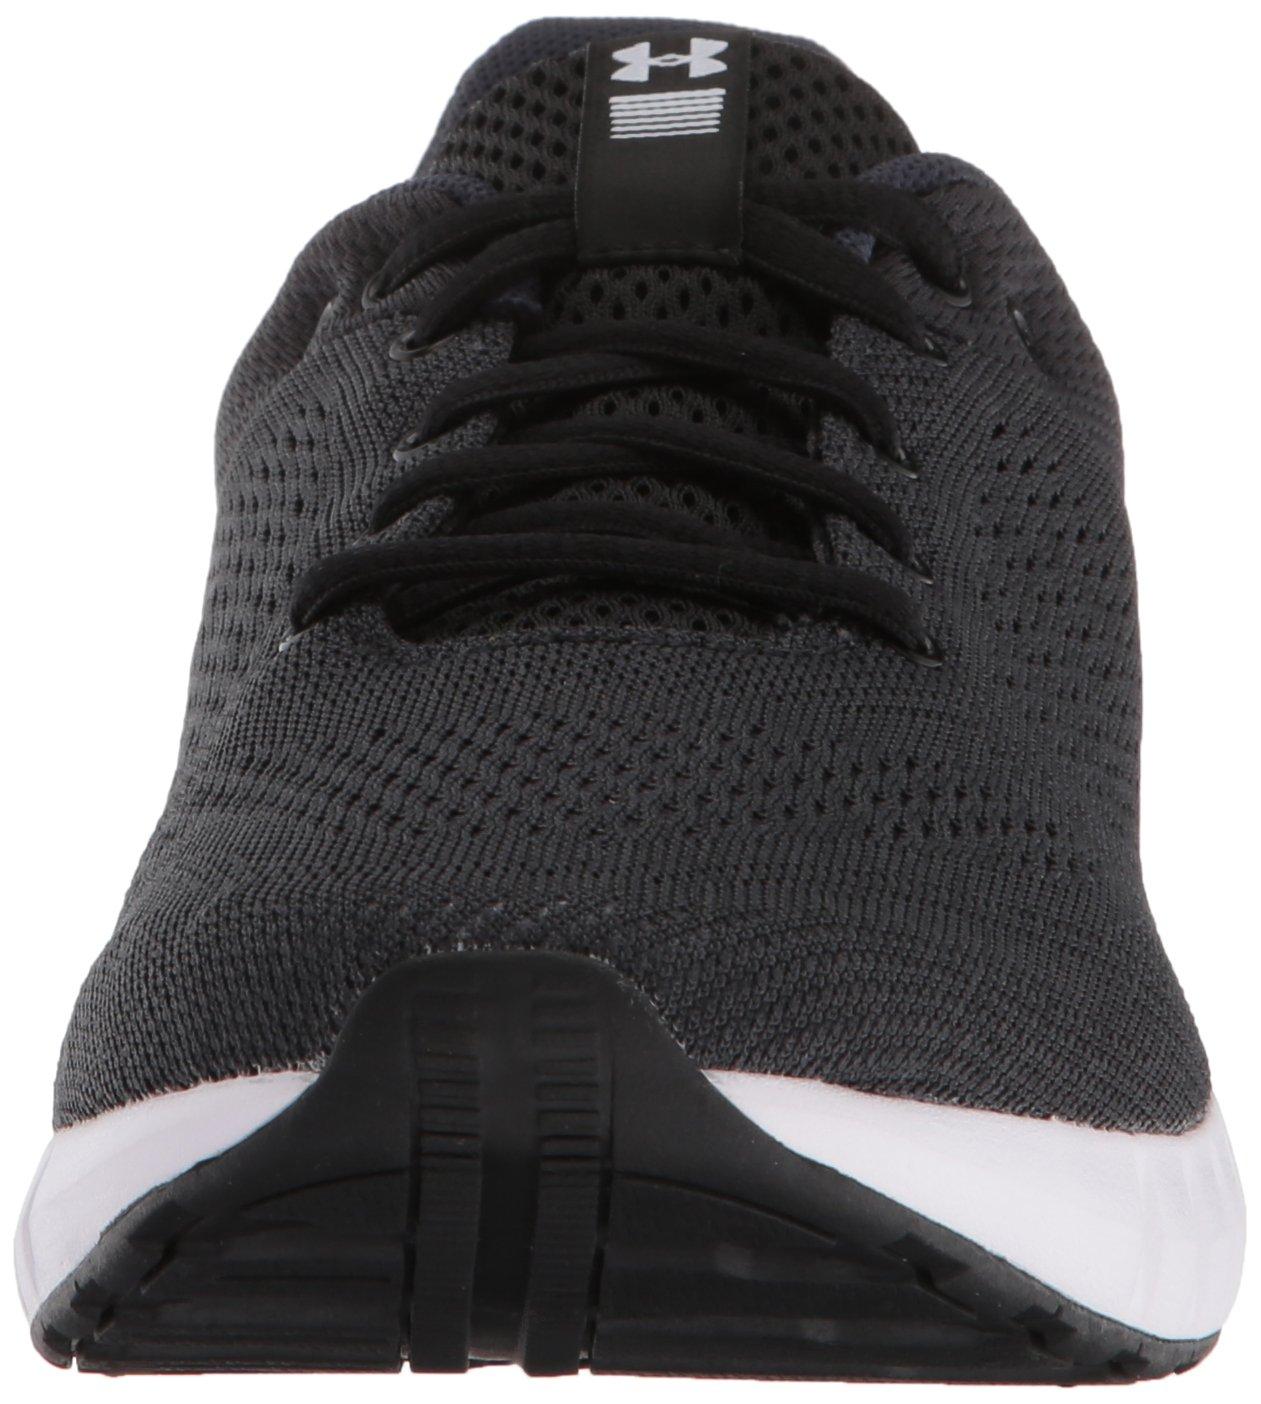 Under Armour Women's Micro G Pursuit Sneaker B07144PWVY 8.5 M US Anthracite (100)/Black